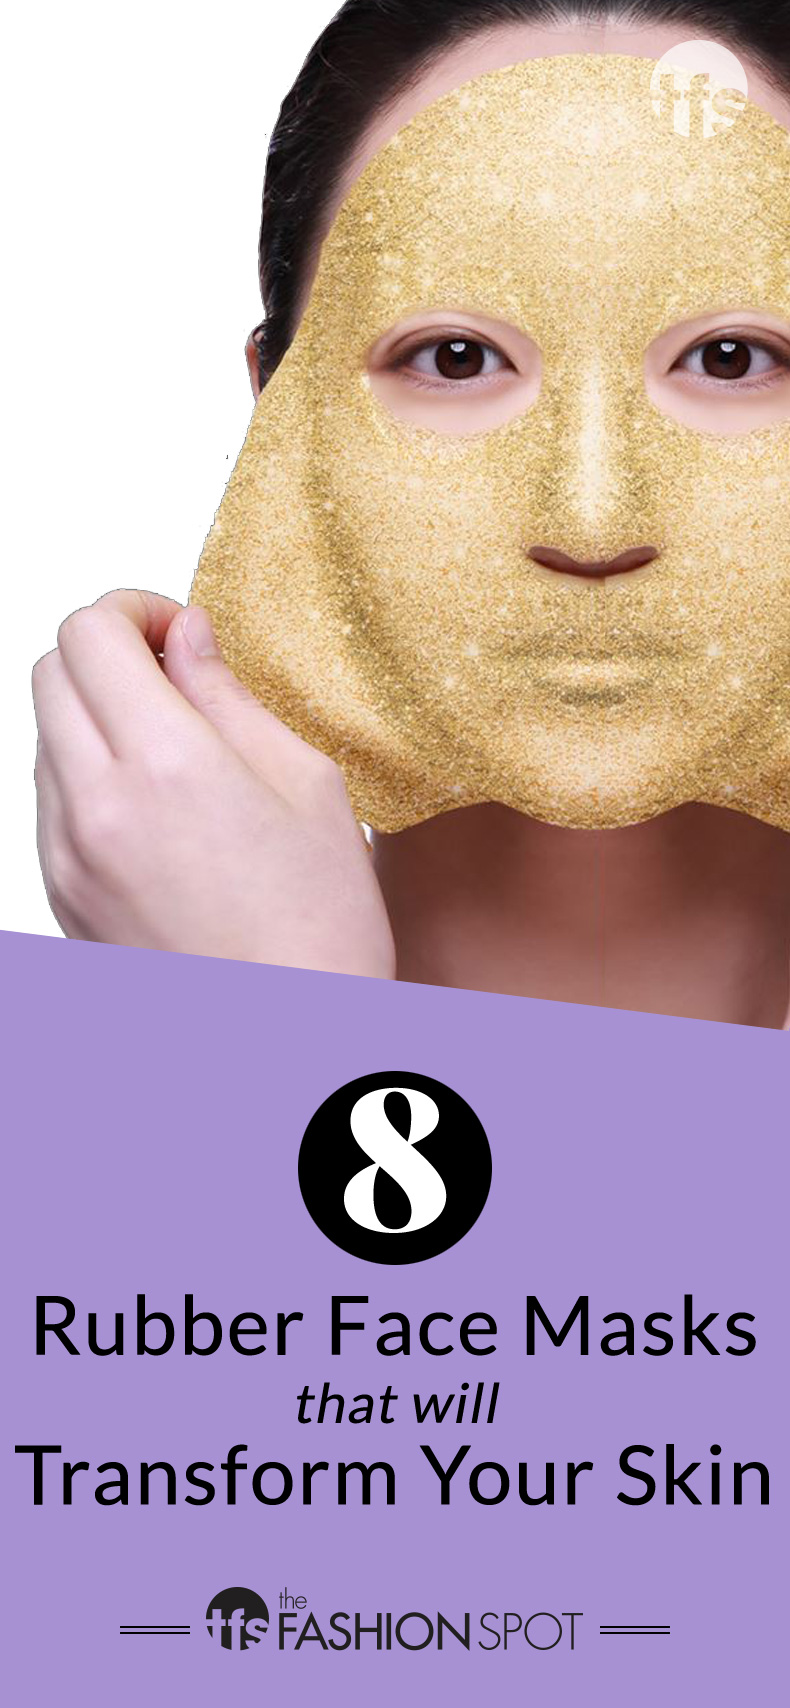 Modeling Rubber Masks Are Even Better Than Sheet Masks